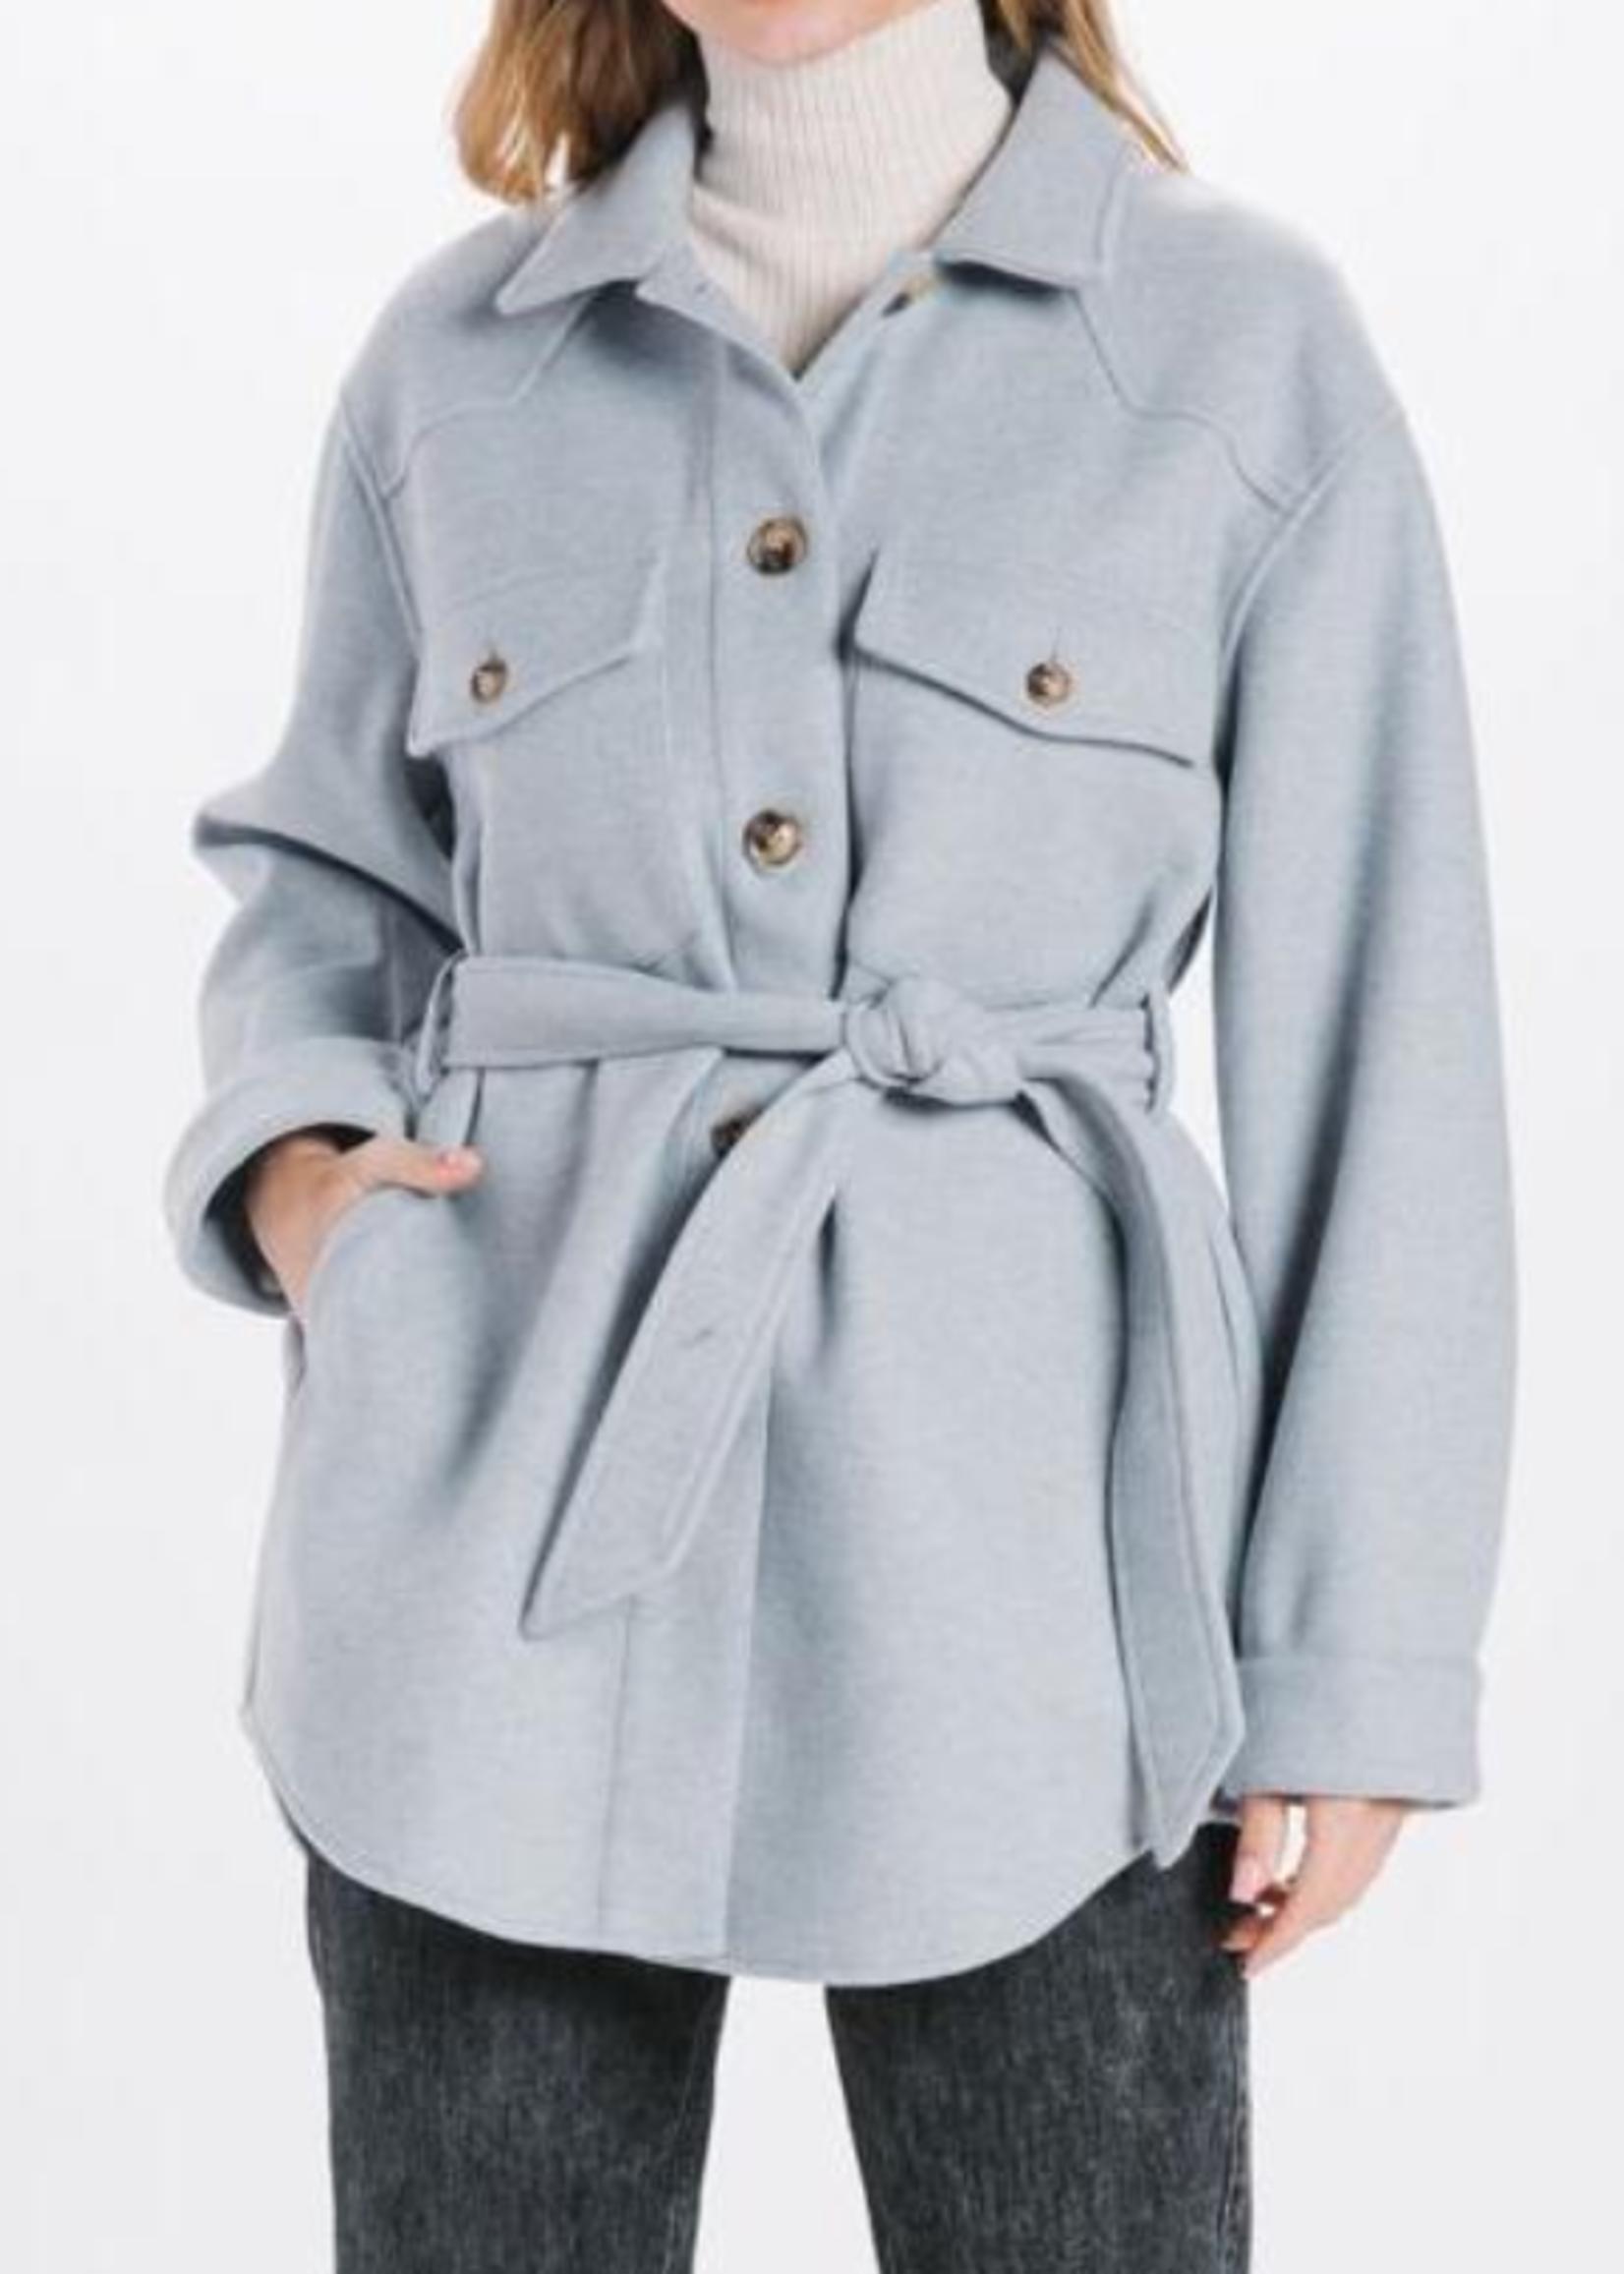 Elitaire Boutique Button Up Jacket in Blue